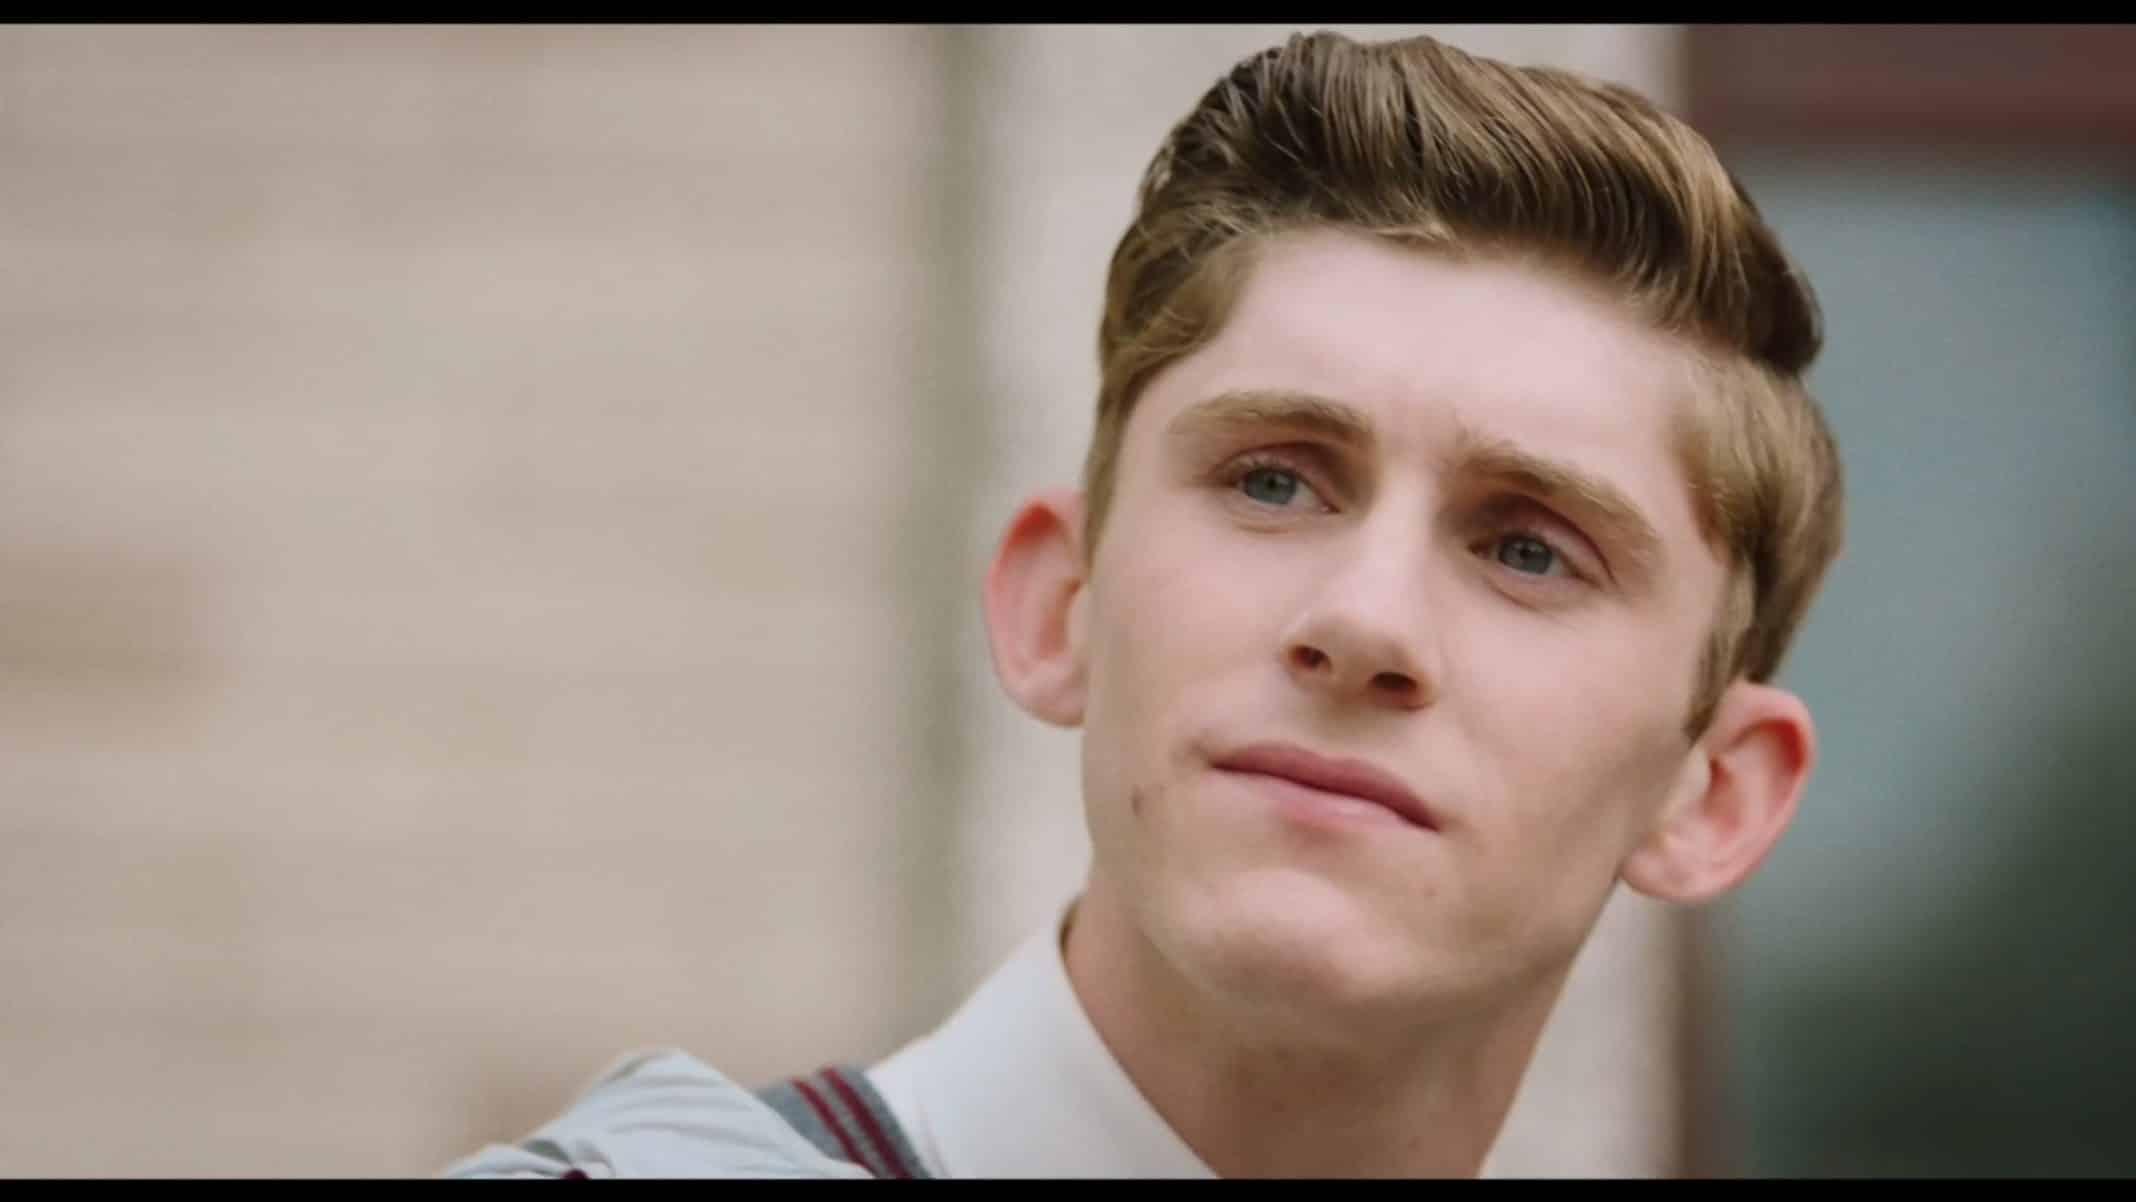 Eddie (Fionn O'Shea) sitting on stairs at school